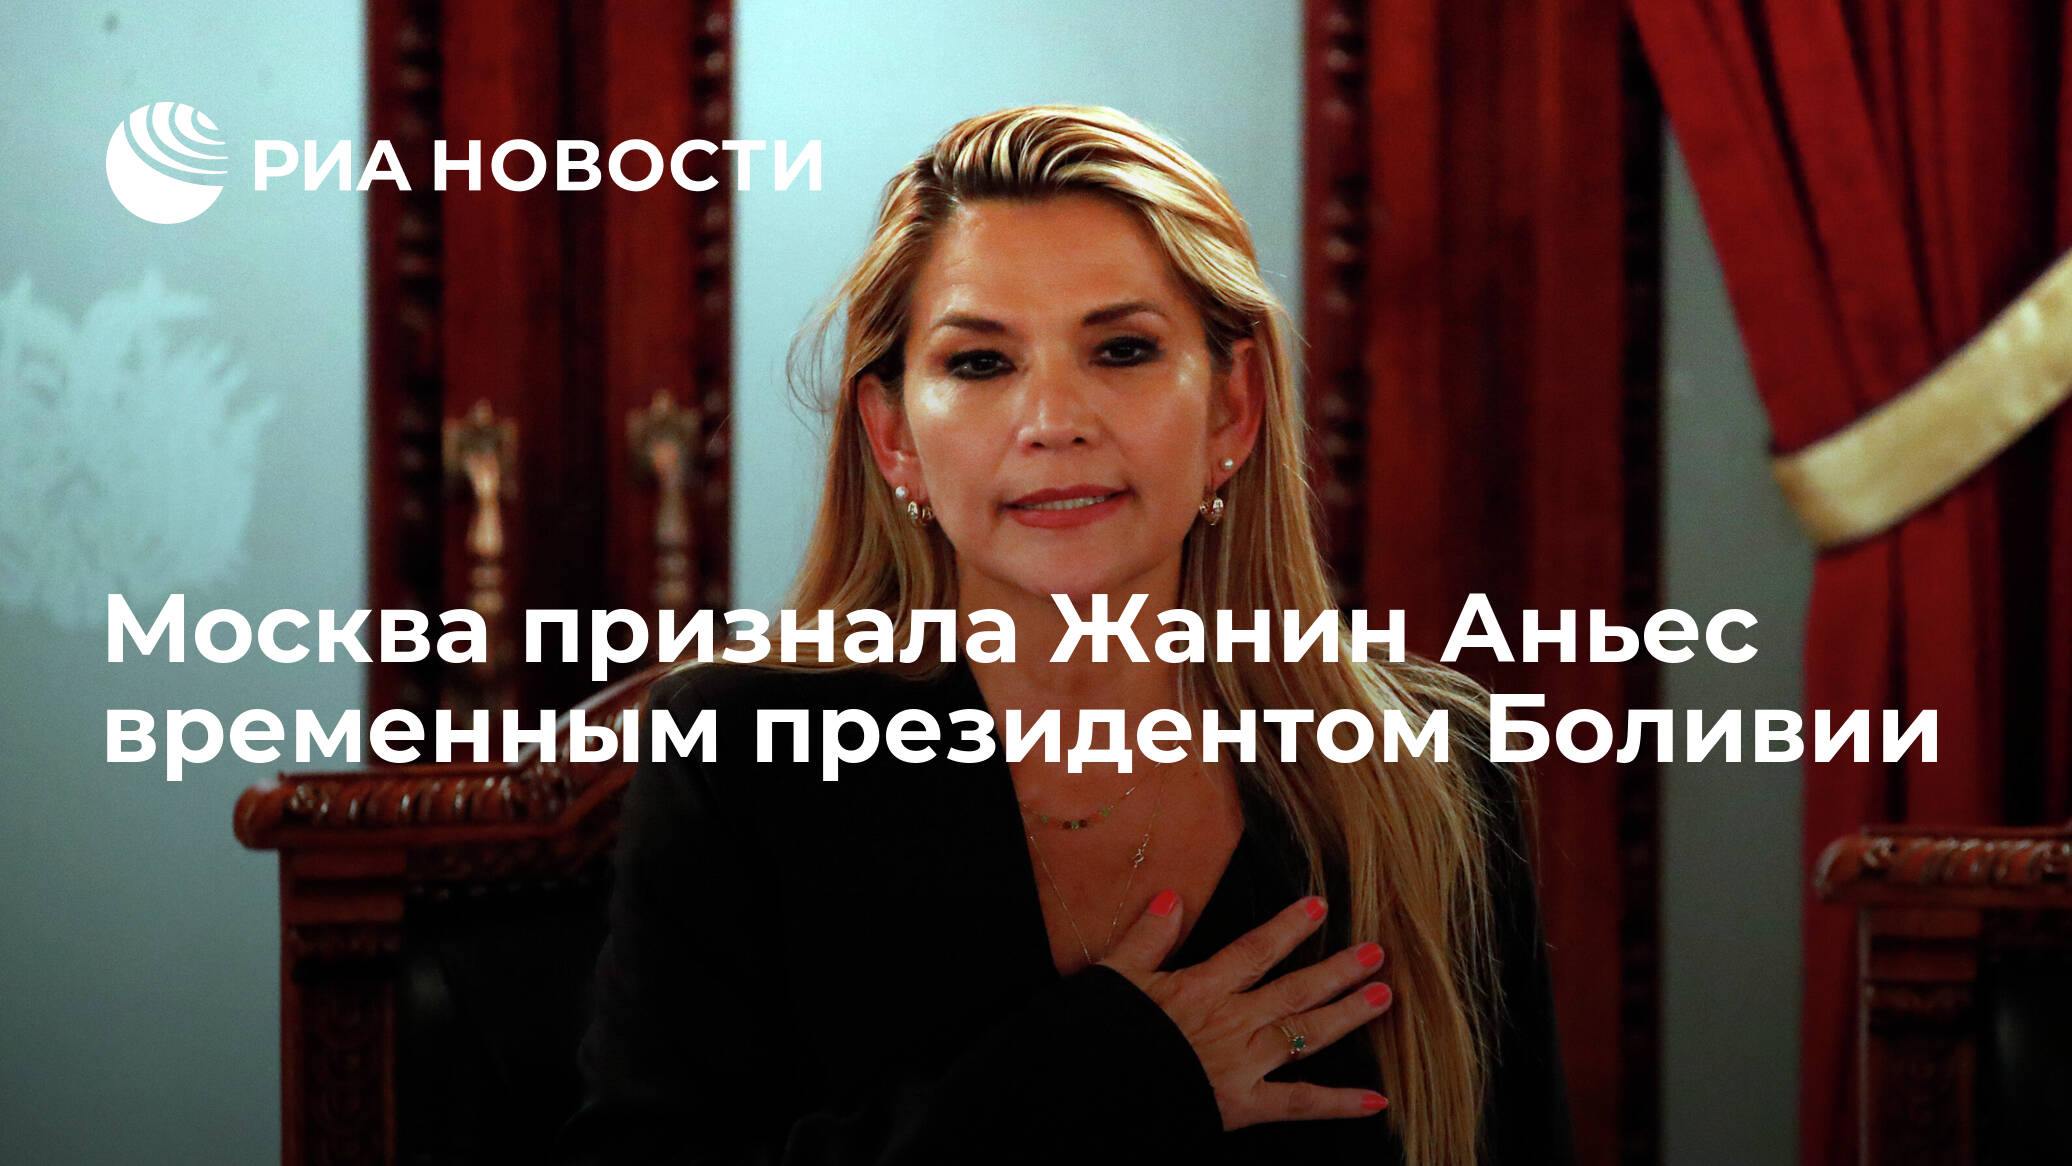 Москва признала Жанин Аньес временным президентом Боливии